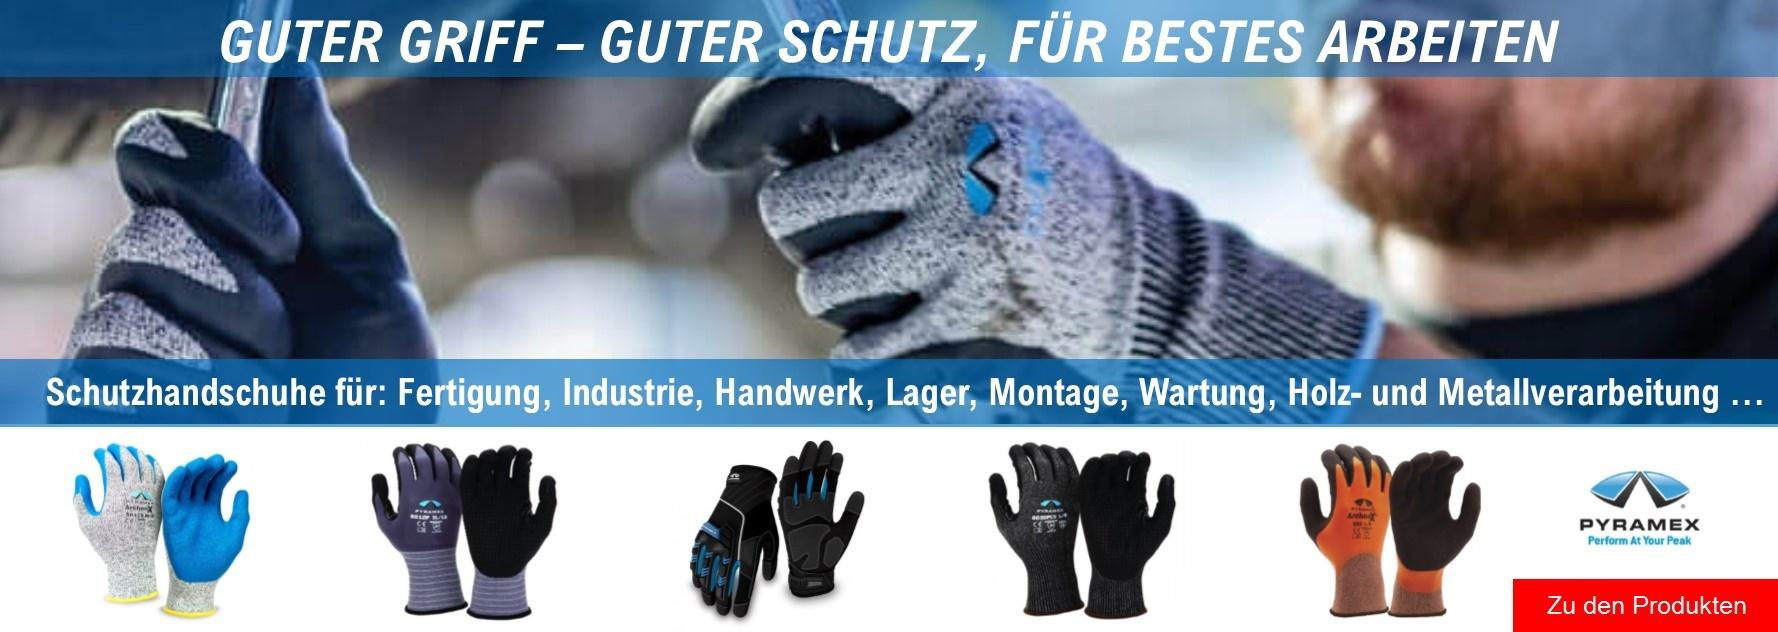 Pyramex Handschuhe